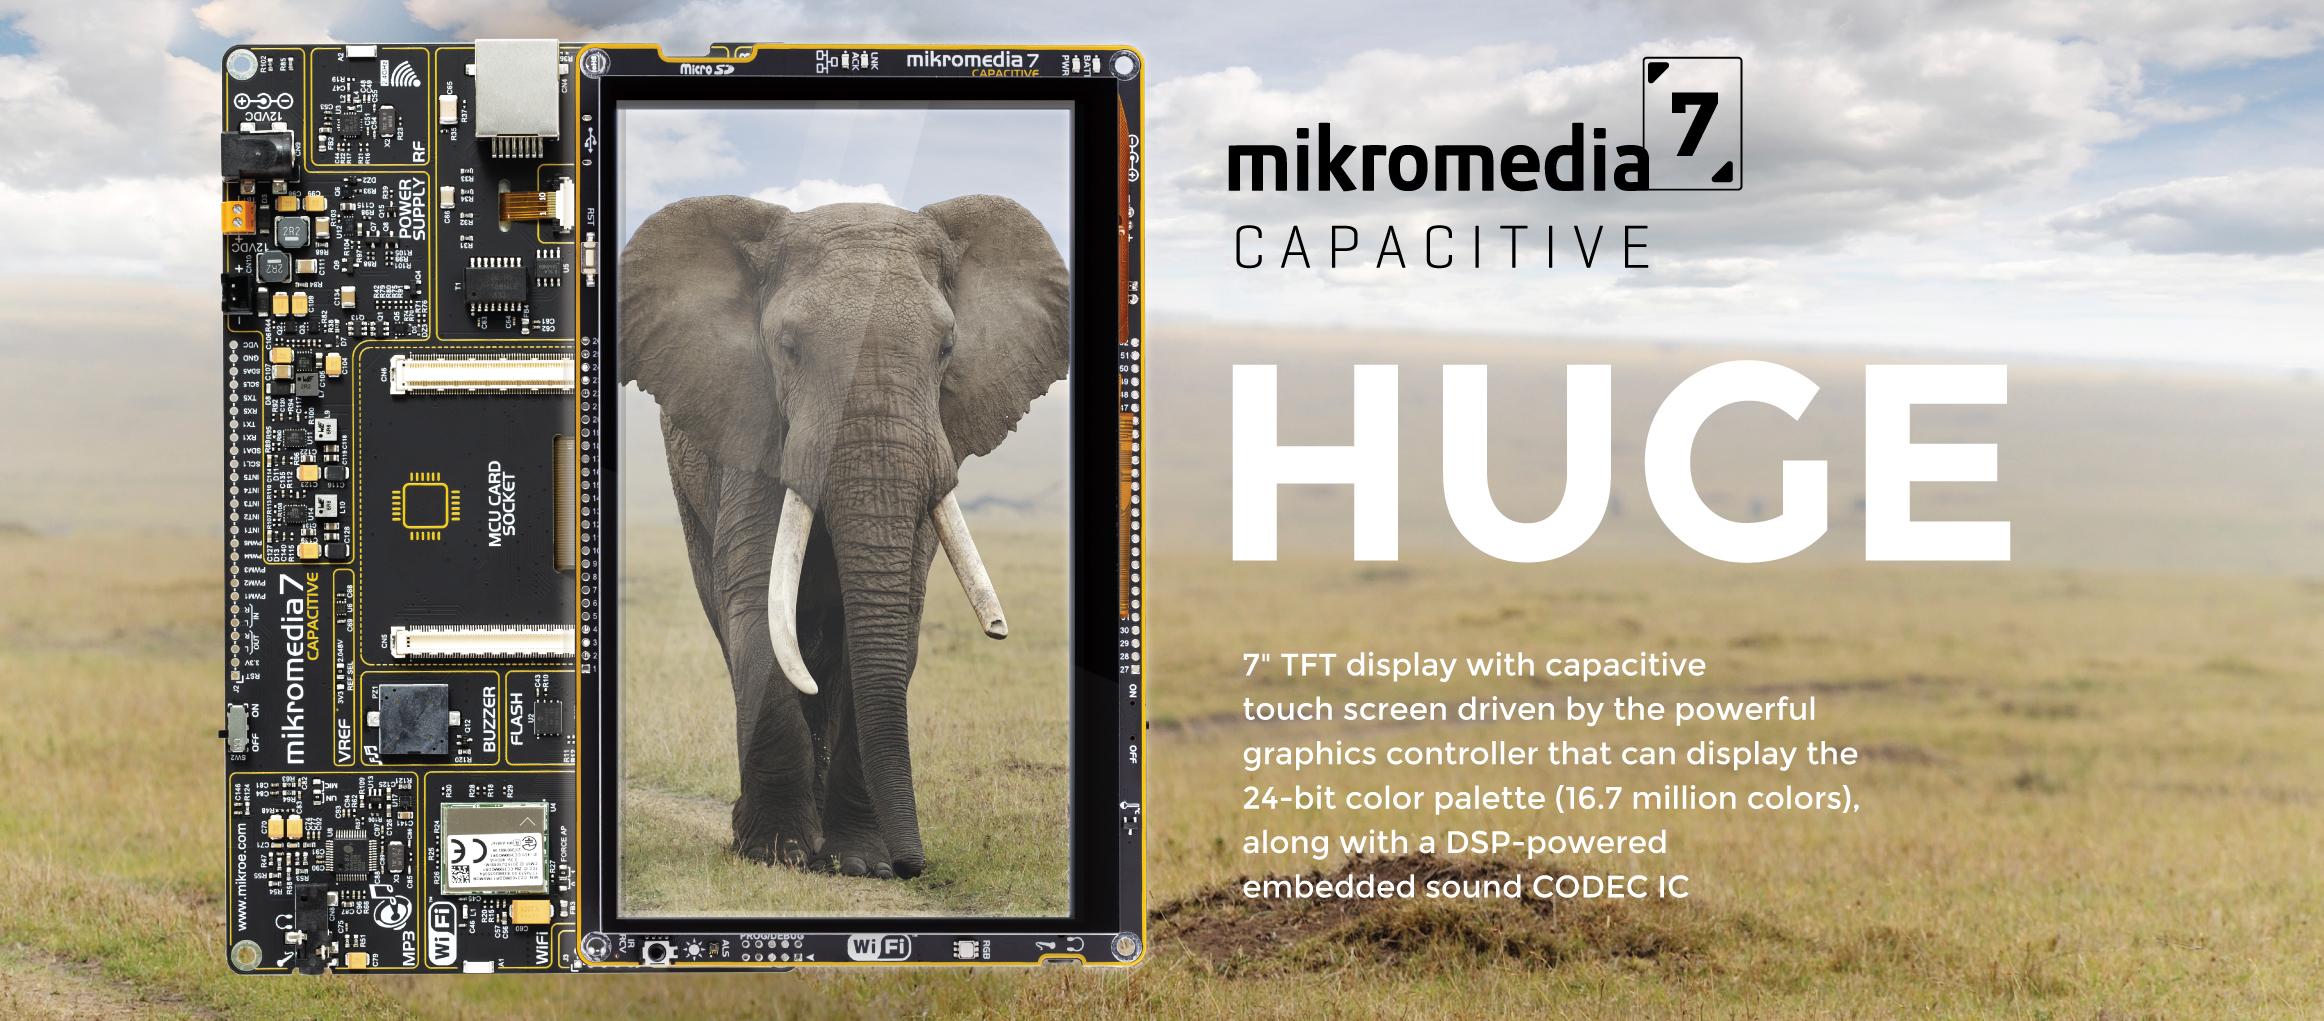 mikromedia 7 CAPACITIVE HUGE